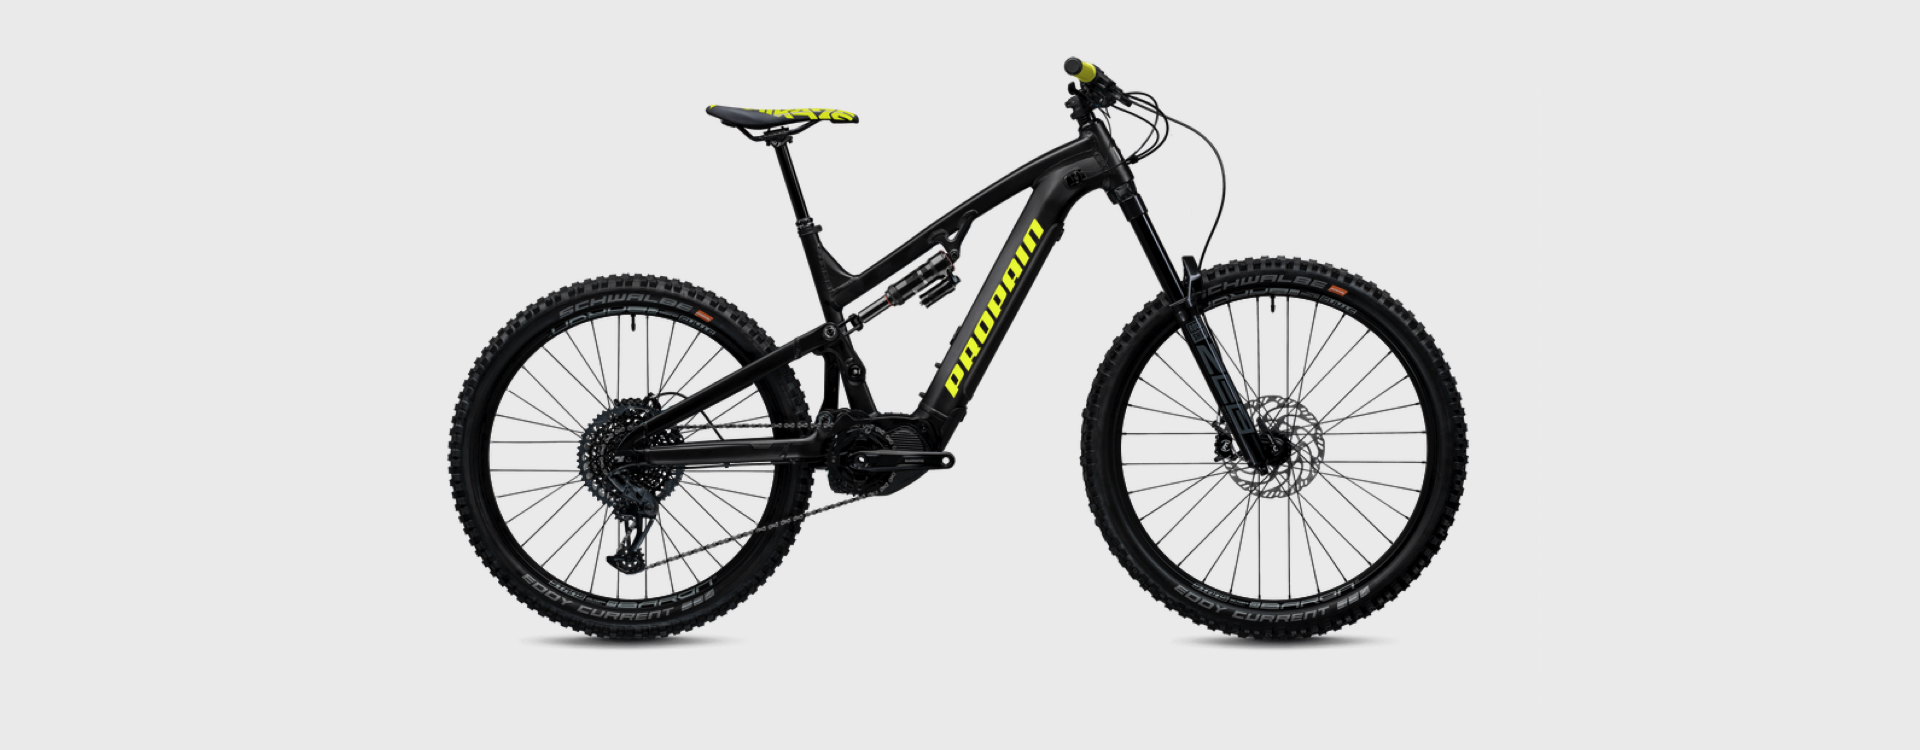 Bike Verleih Gummersbach Propain Bikes Testcenter NRW Ekano 9 - AL - L - 29 - Black - 1920x750